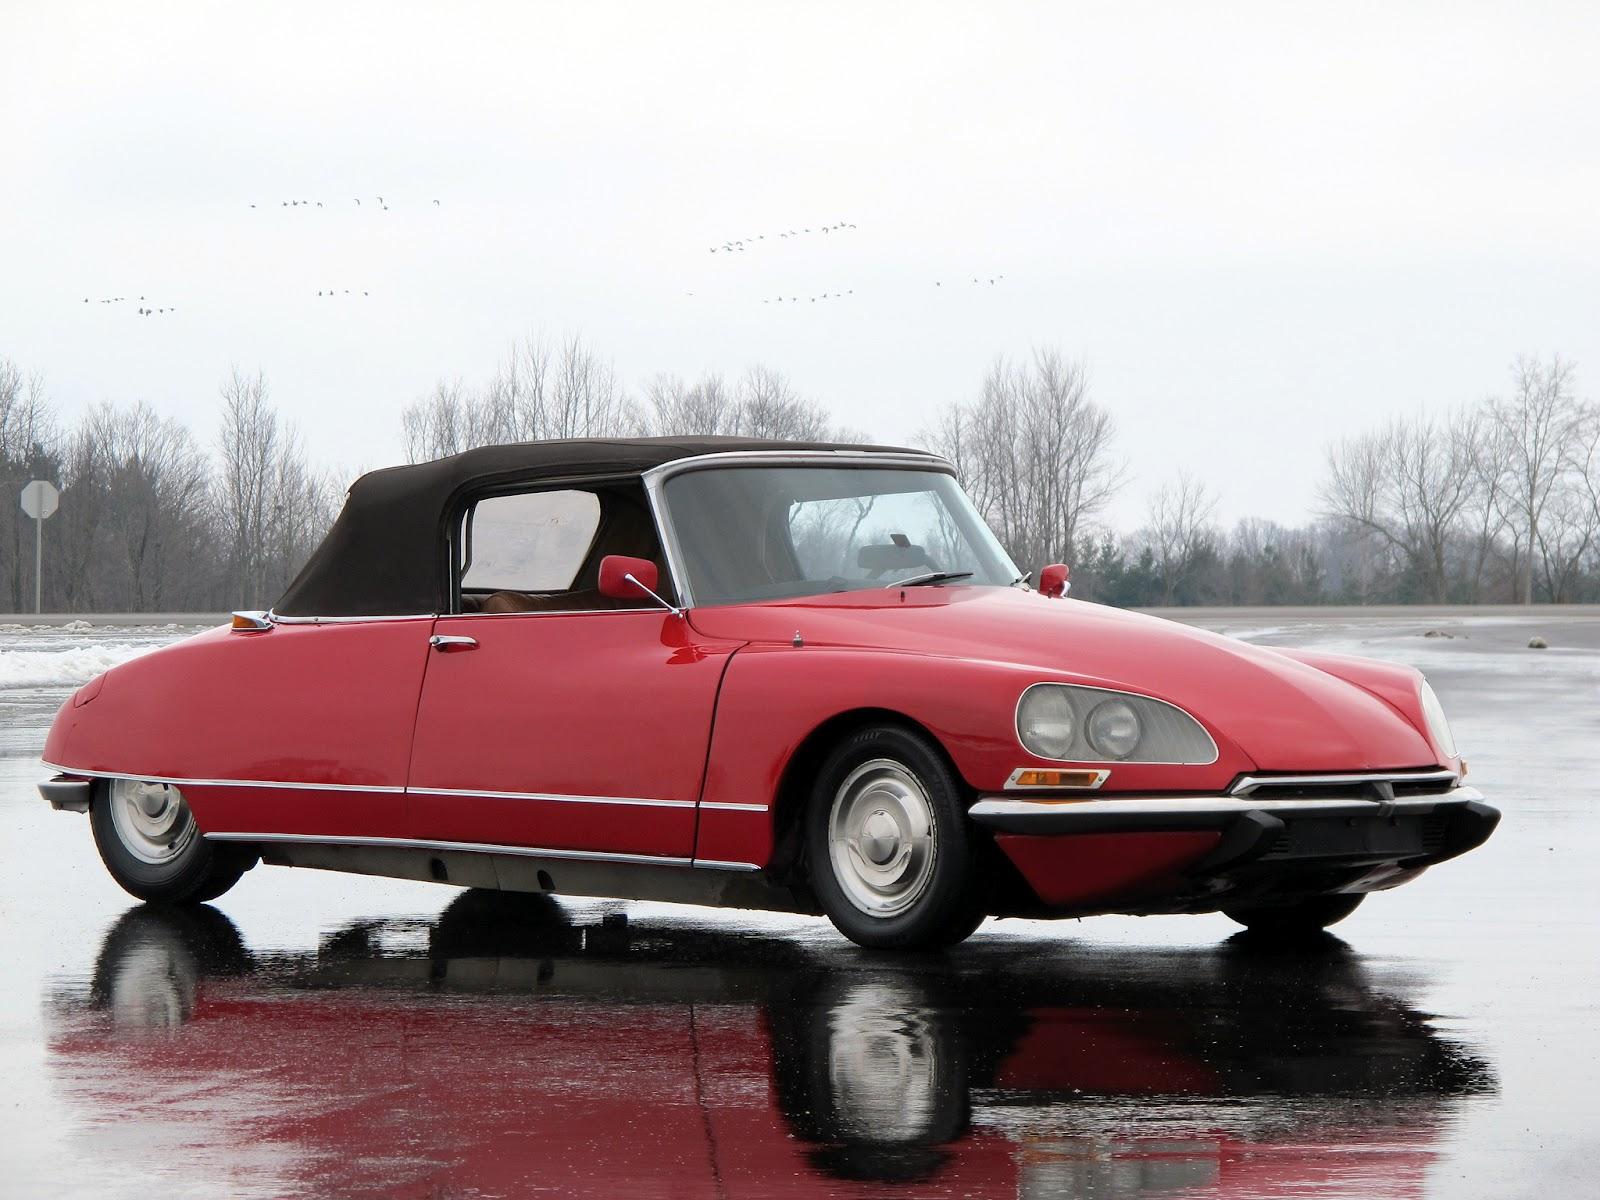 retro cars citro n ds 19 cabriolet 39 1961 71 1. Black Bedroom Furniture Sets. Home Design Ideas